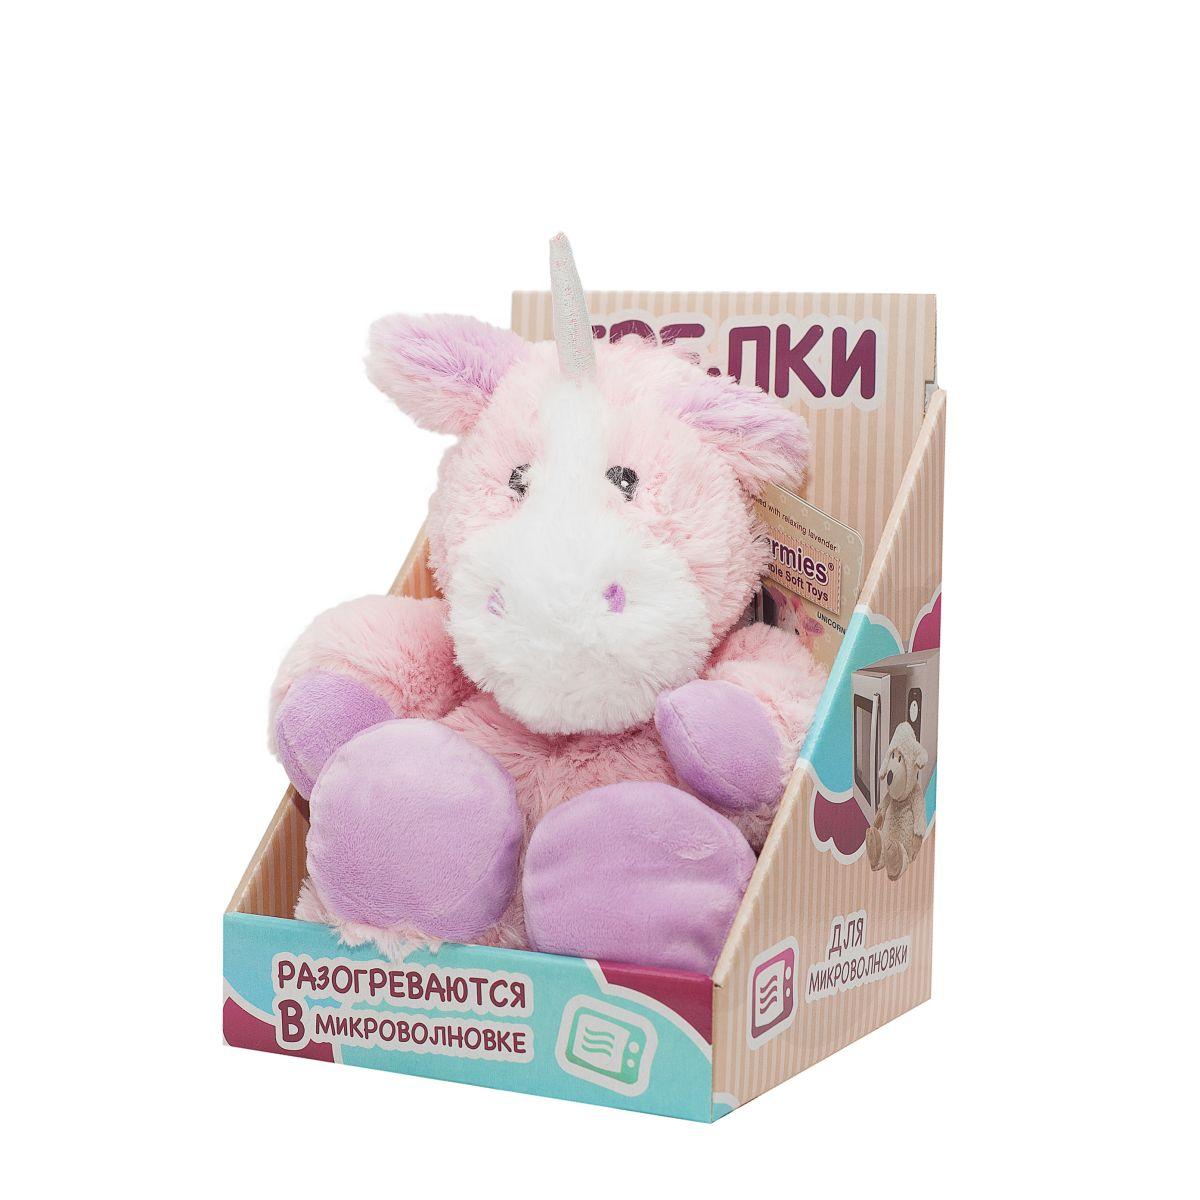 Пинкл (Pinkl) | Игрушка-грелка Единорог | Intelex Ltd Warmies Cozy Plush Unicorn